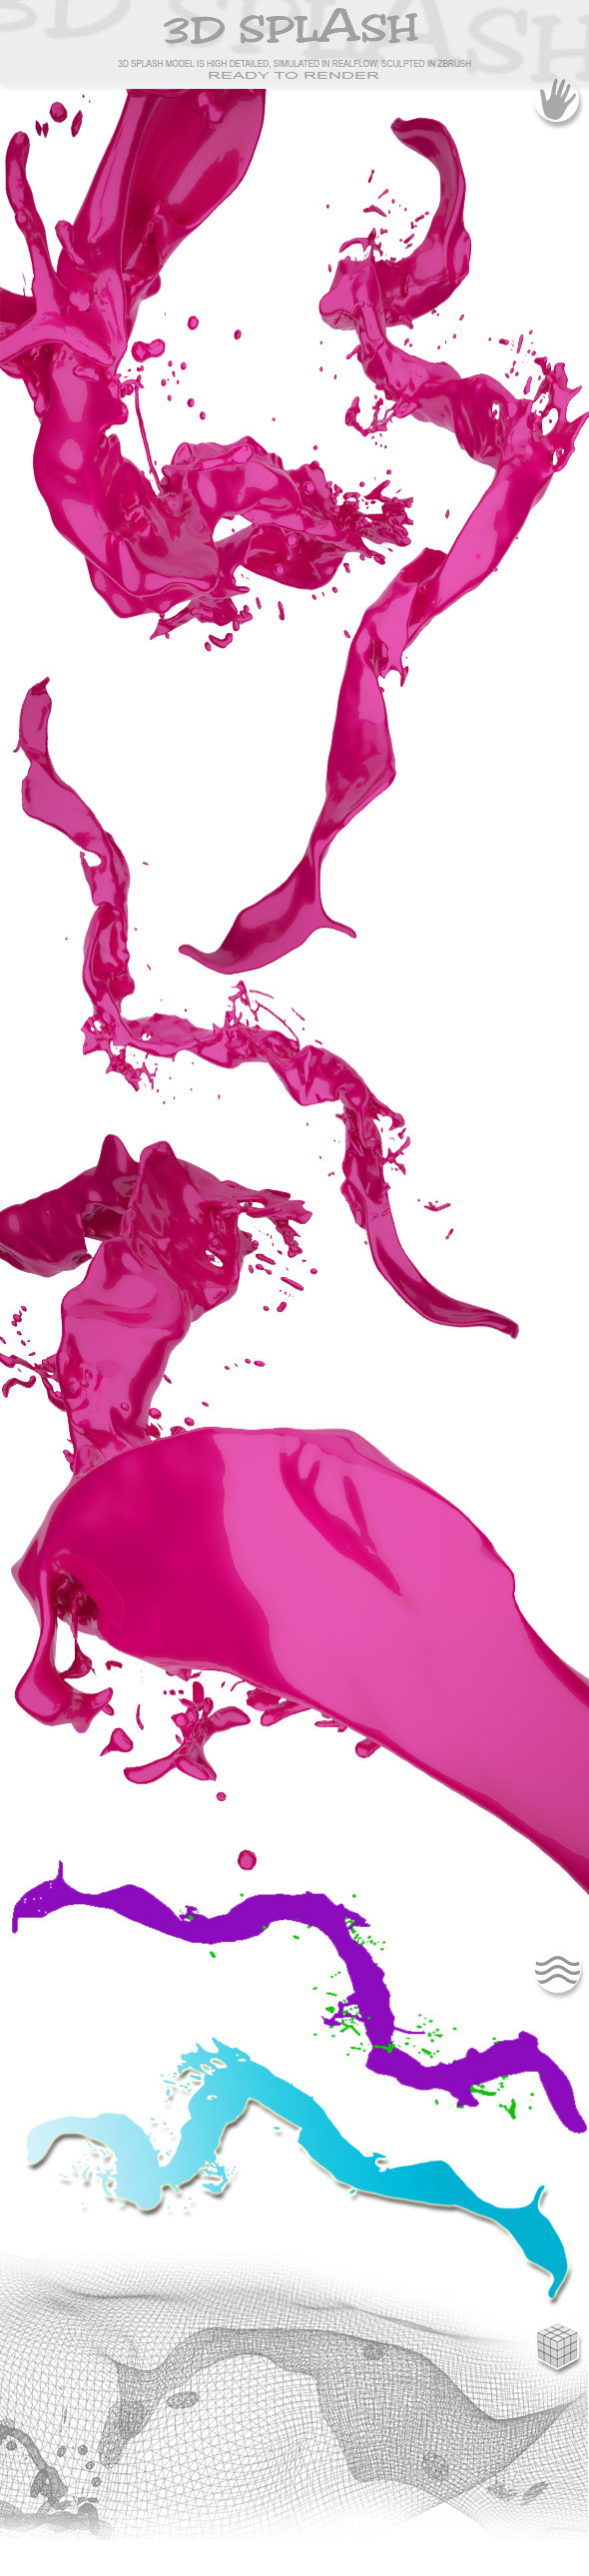 HD Water Paint Liquid Splash 17 - 3DOcean Item for Sale